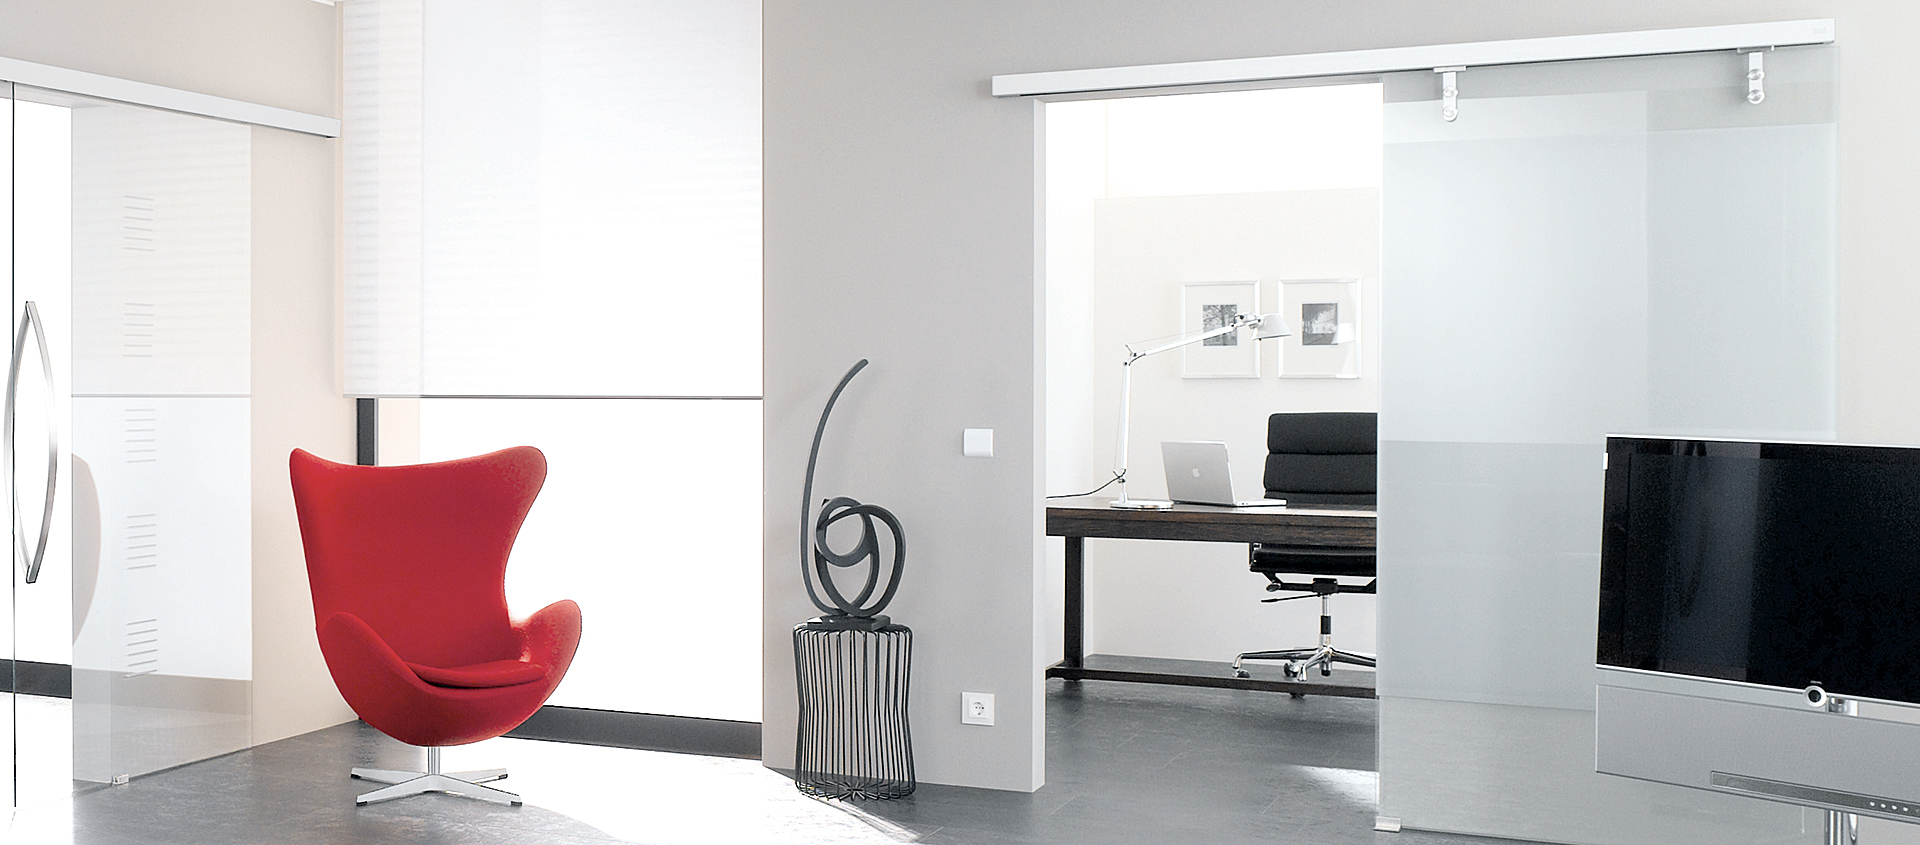 Dorma Glass Design System By Modernfoldstyles